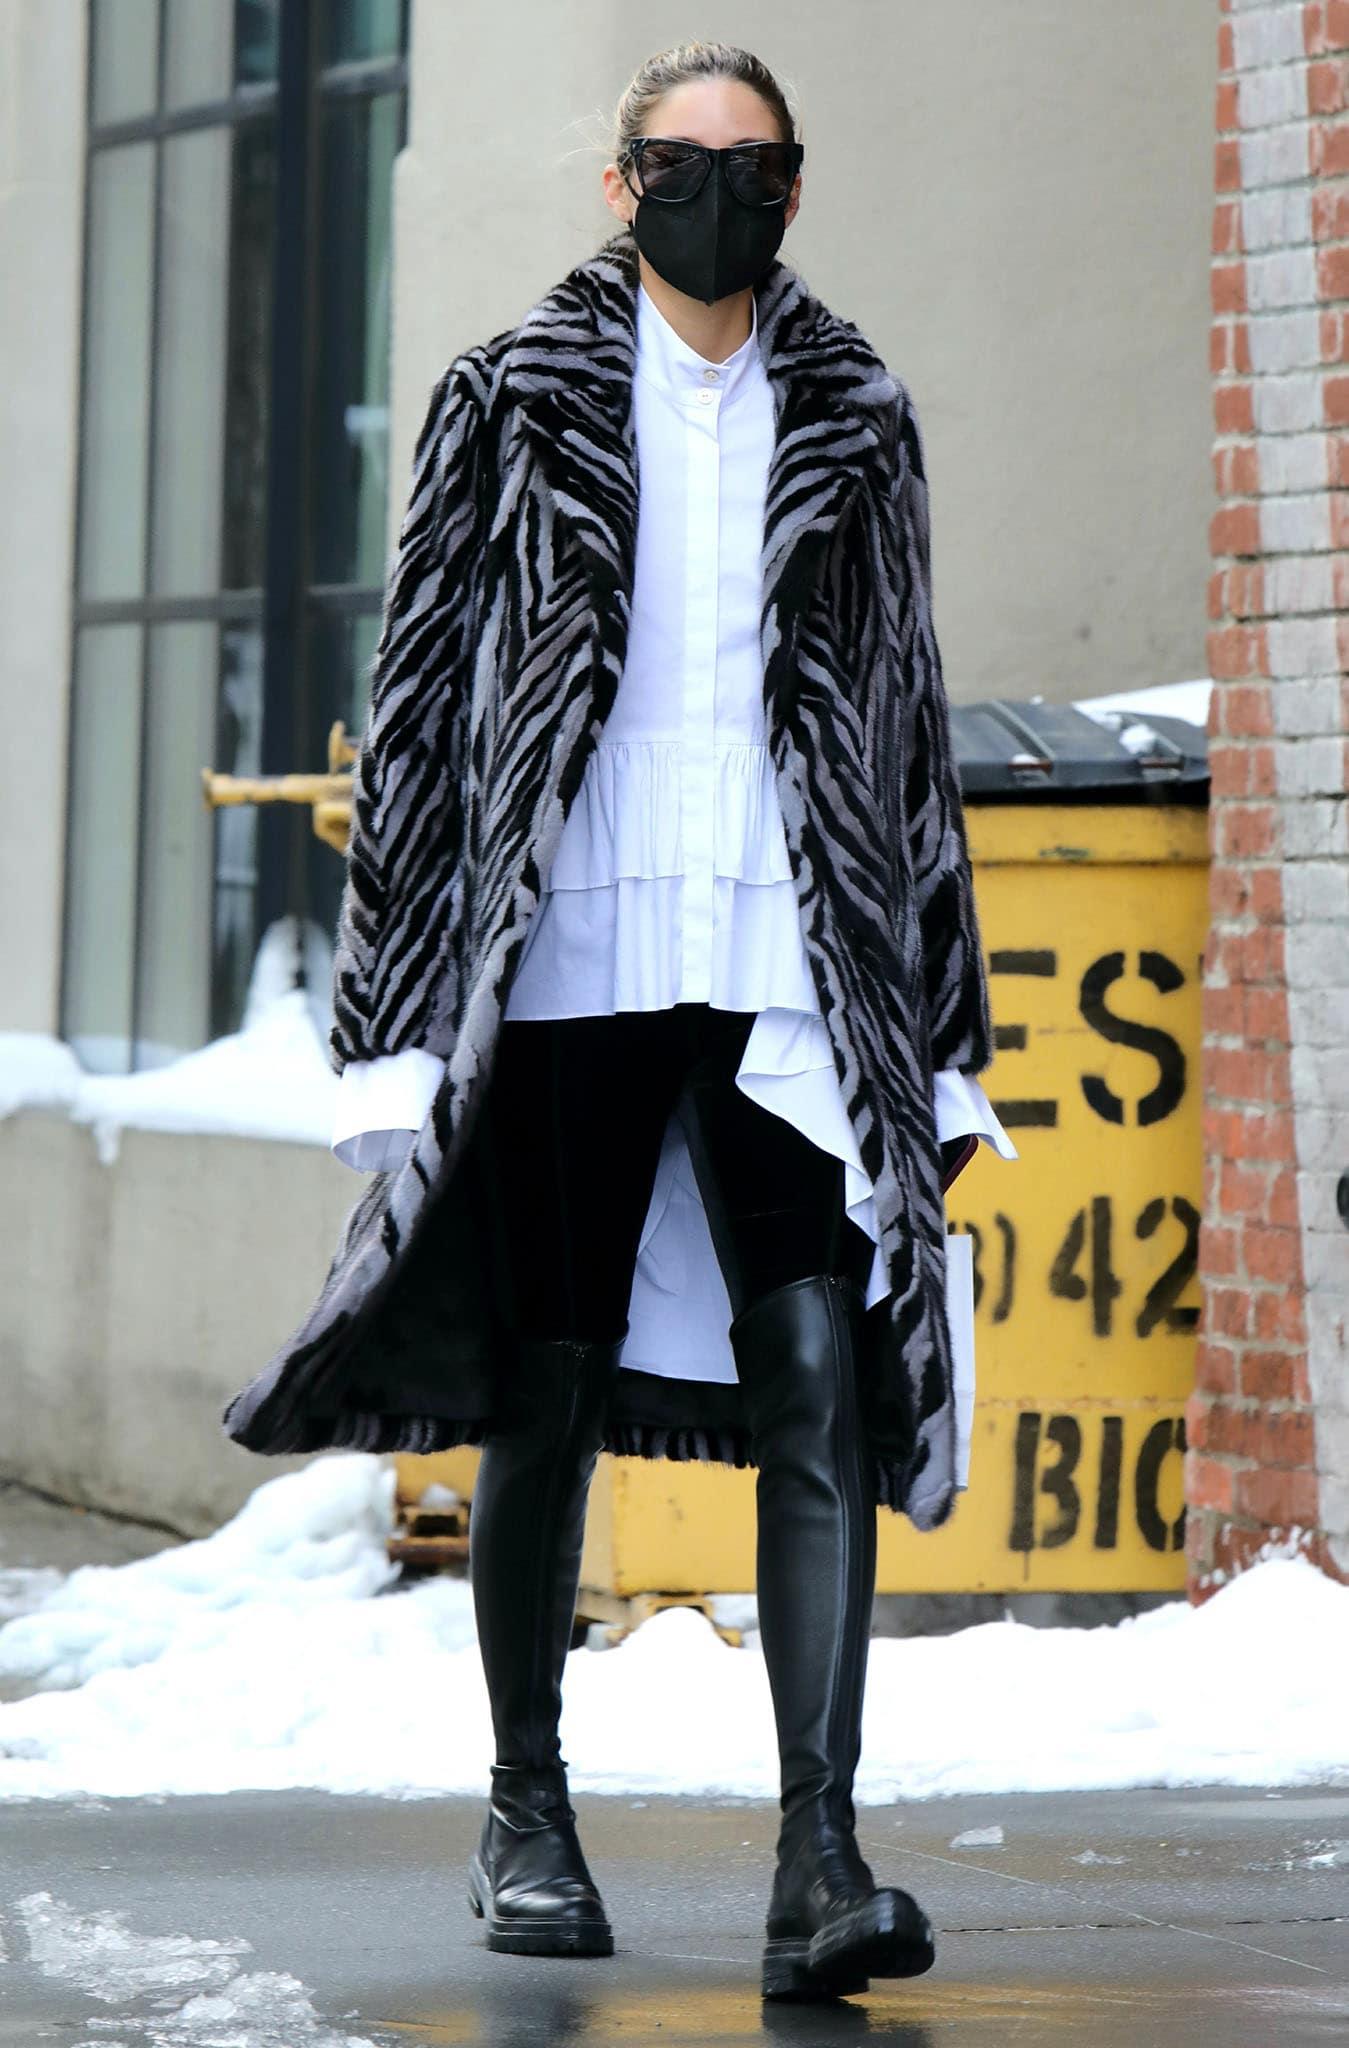 Olivia Palermo stays cozy in a Pologeorgis zebra-striped mink fur coat, white ruffled top, and leggings